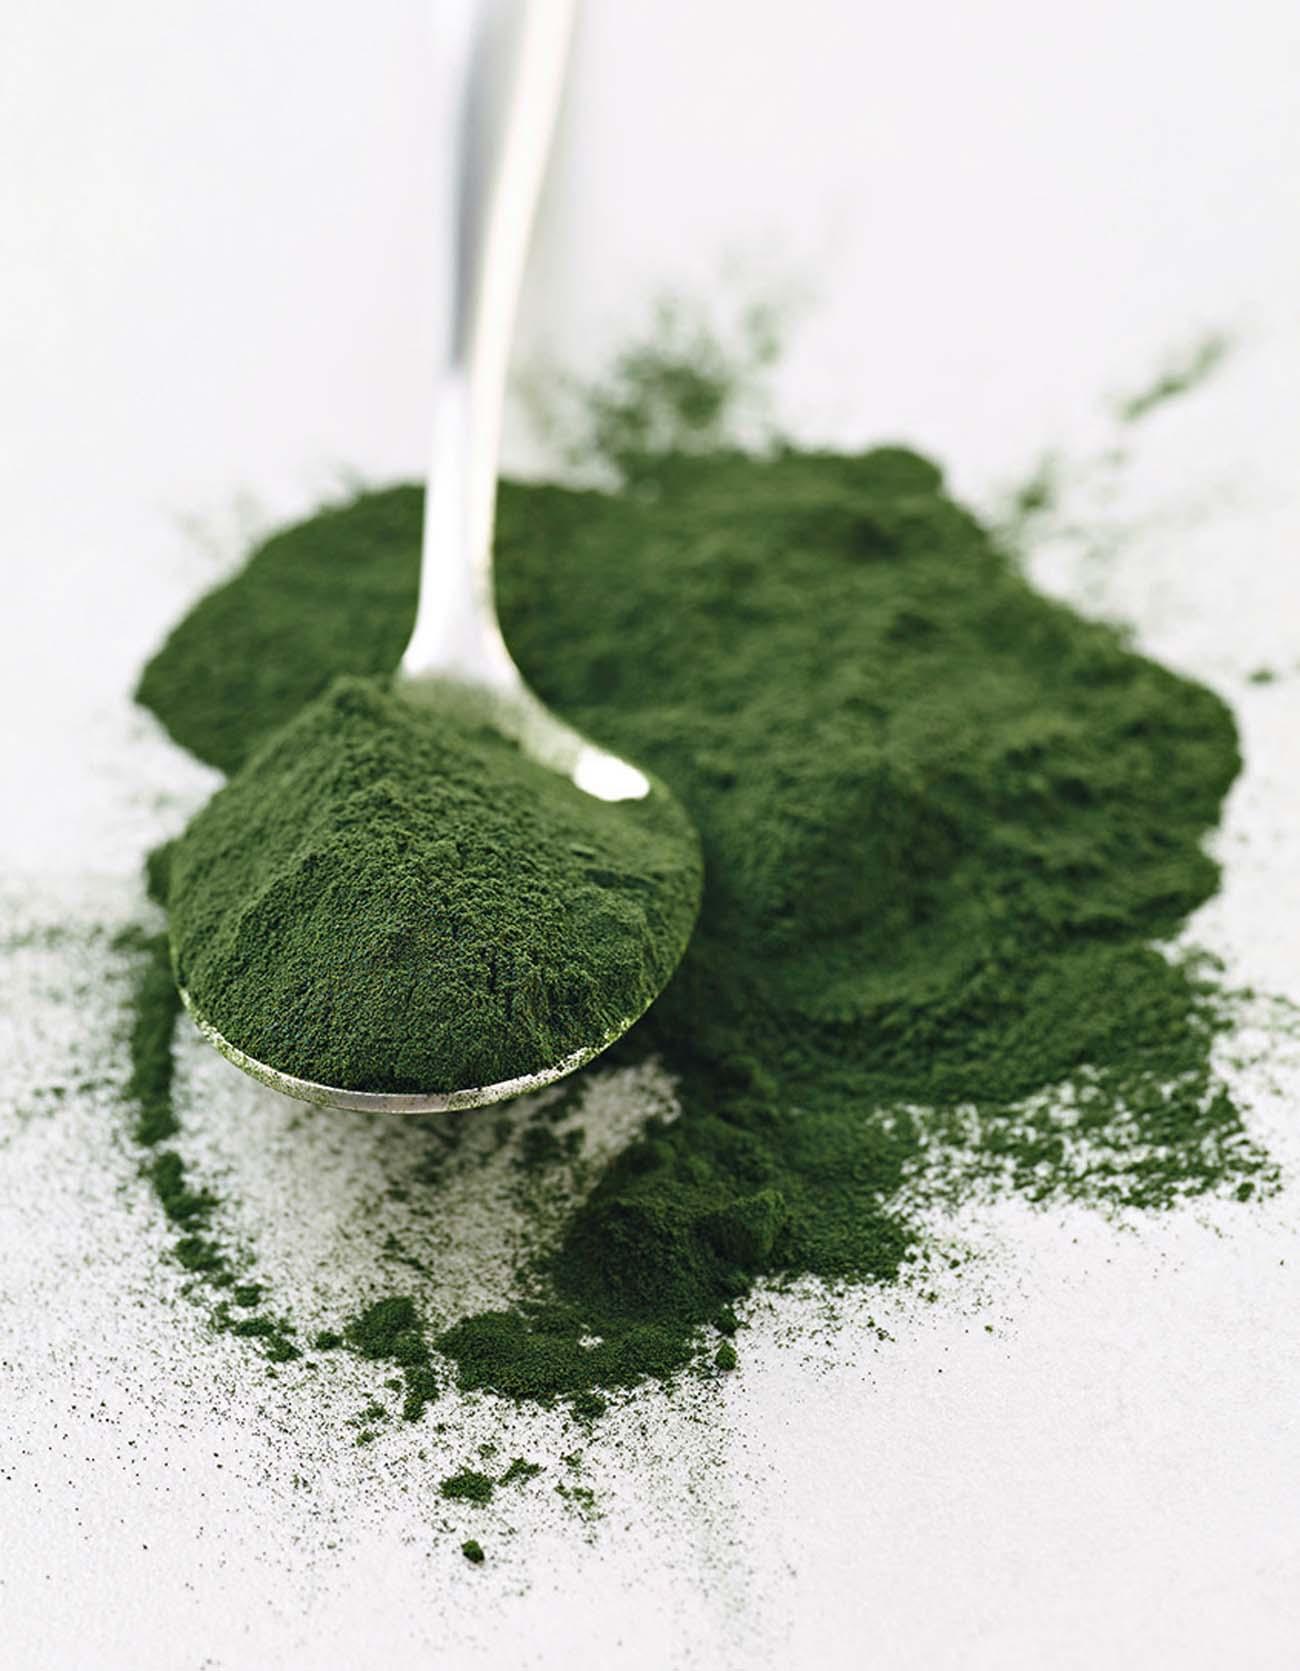 Alga spilurina in polvere cucchiaio